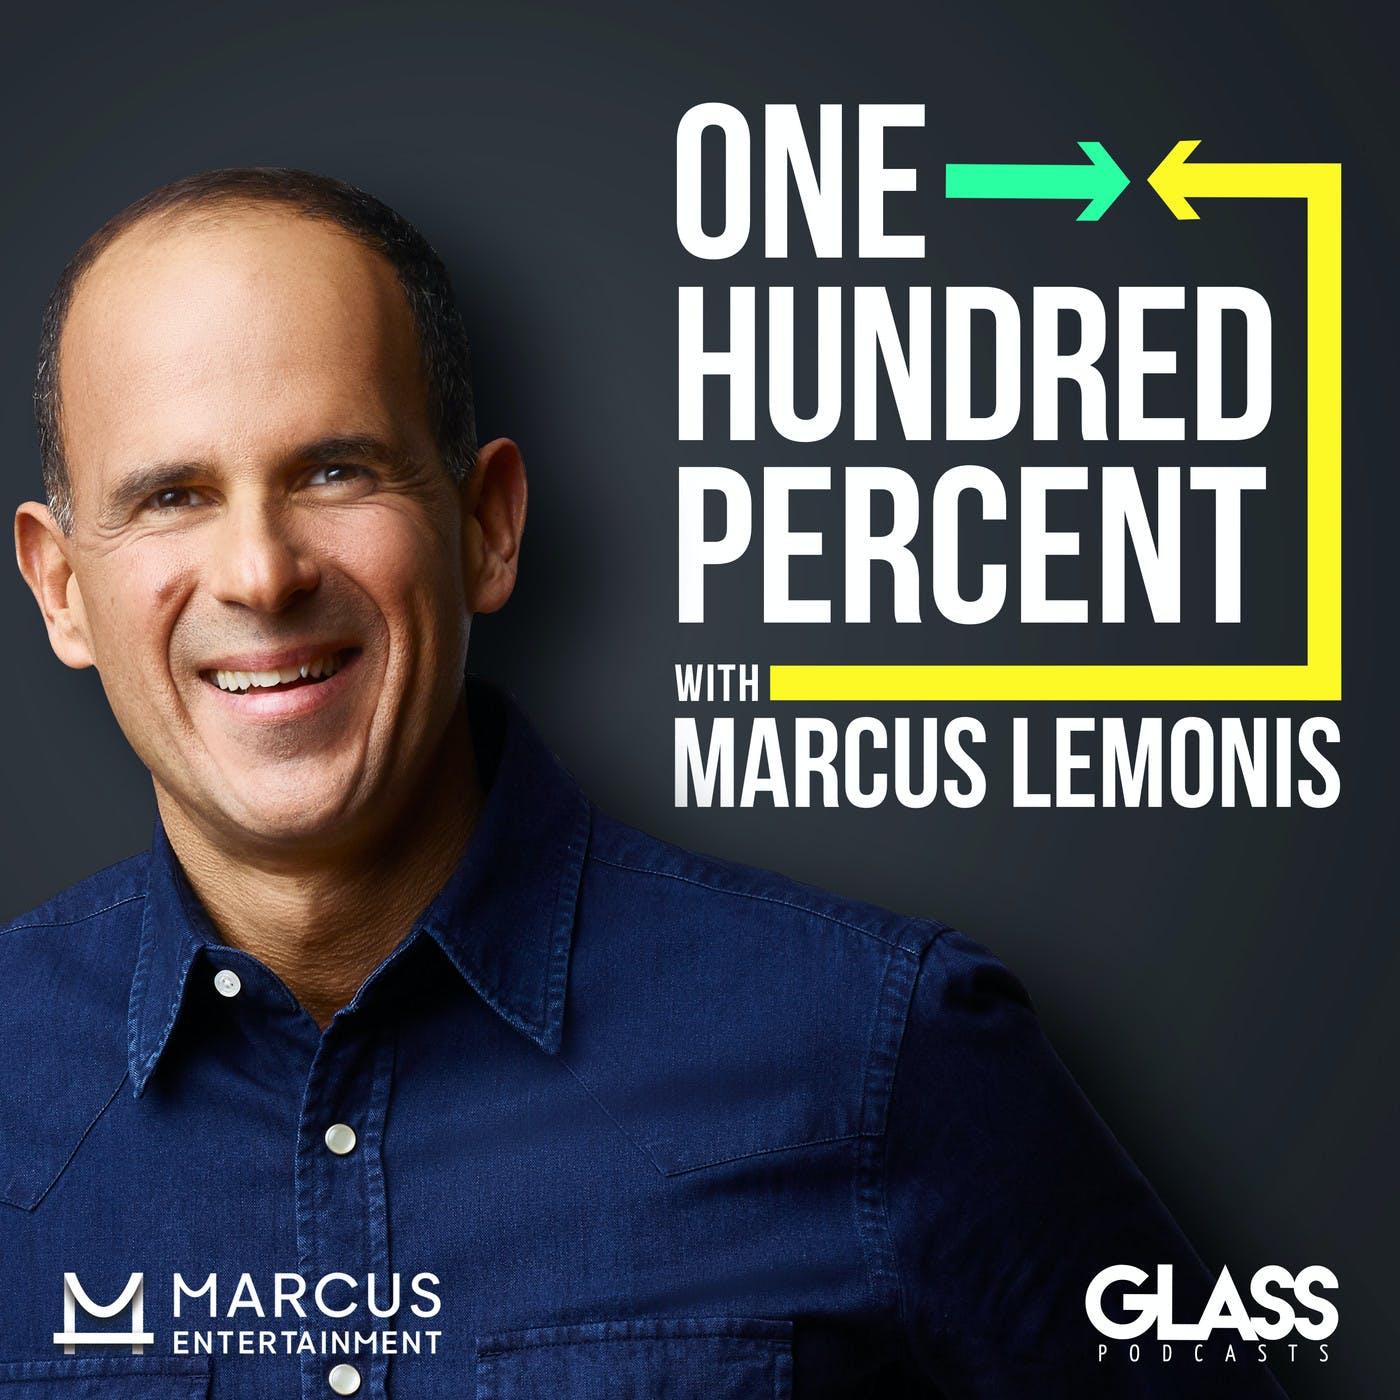 One Hundred Percent with Marcus Lemonis